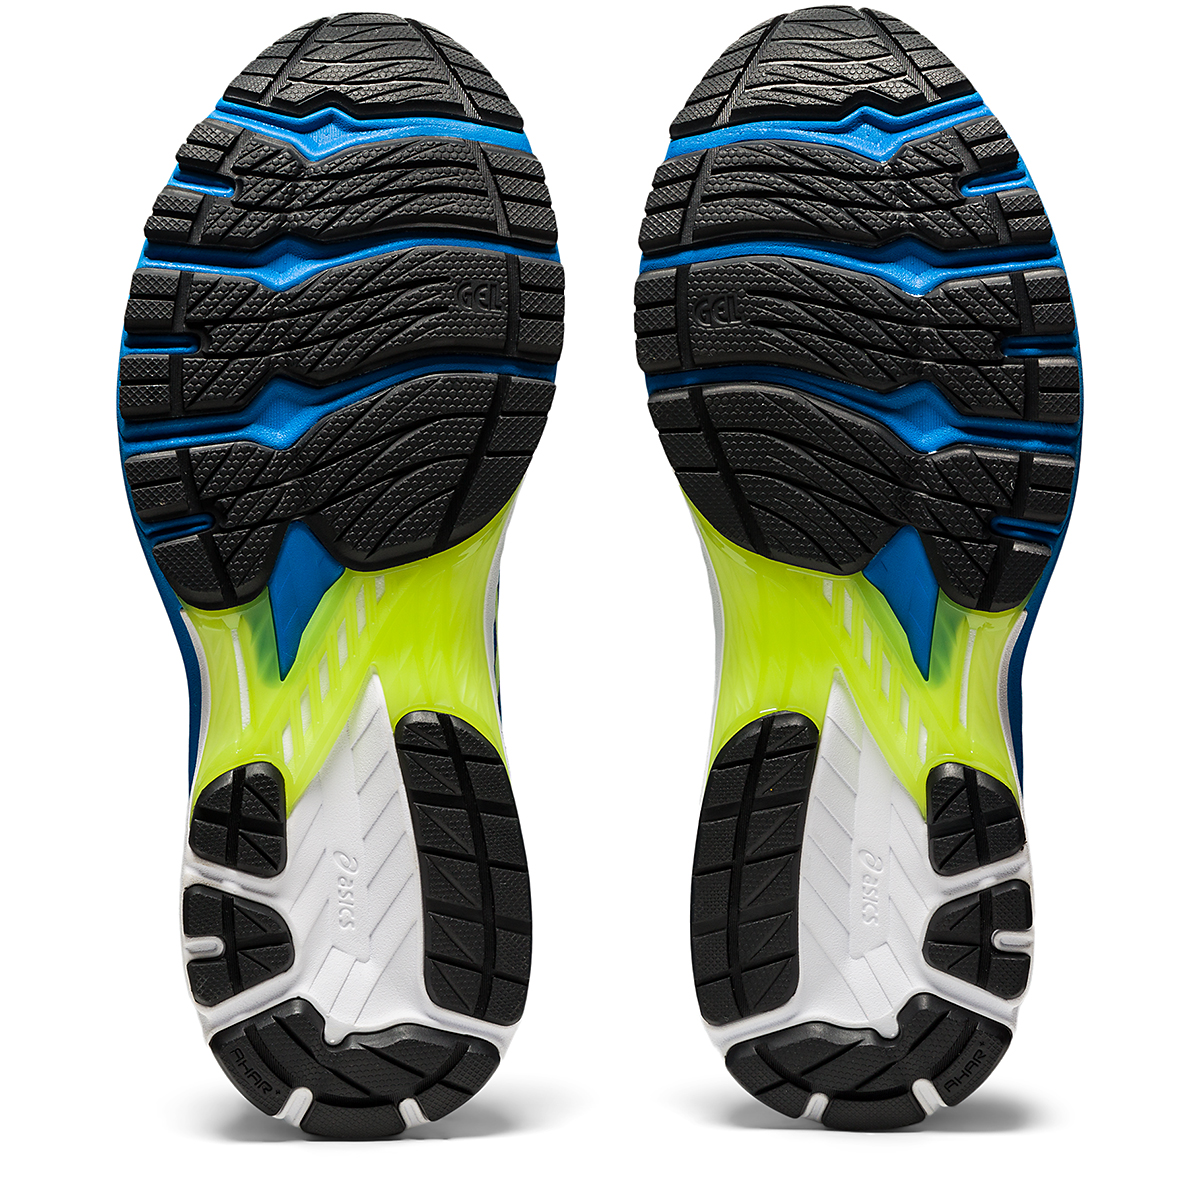 Men's Asics Gt-2000 9 Running Shoe - Color: Directoire Blue - Size: 7 - Width: Regular, Directoire Blue, large, image 4